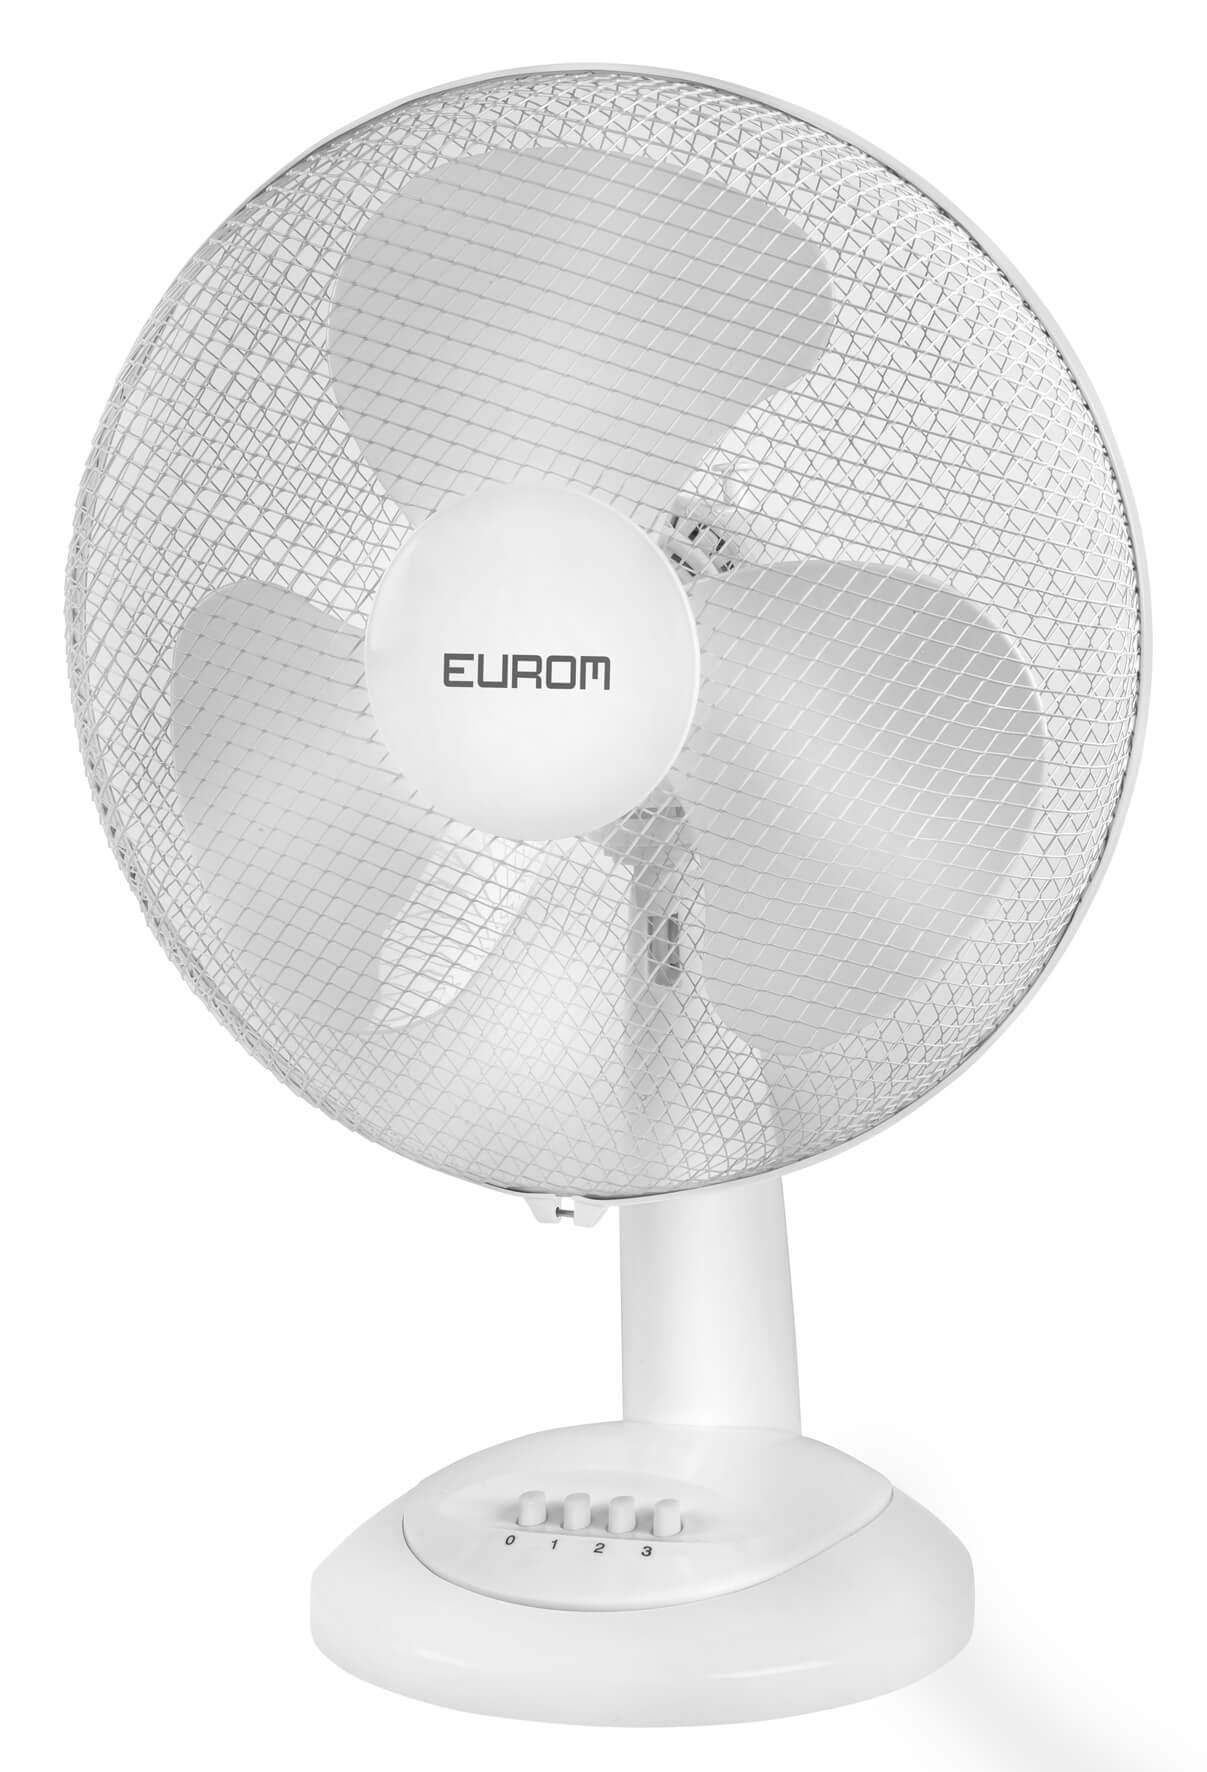 Eurom VT16 tafel model ventilator ø40cm | Tafelventilator 40W